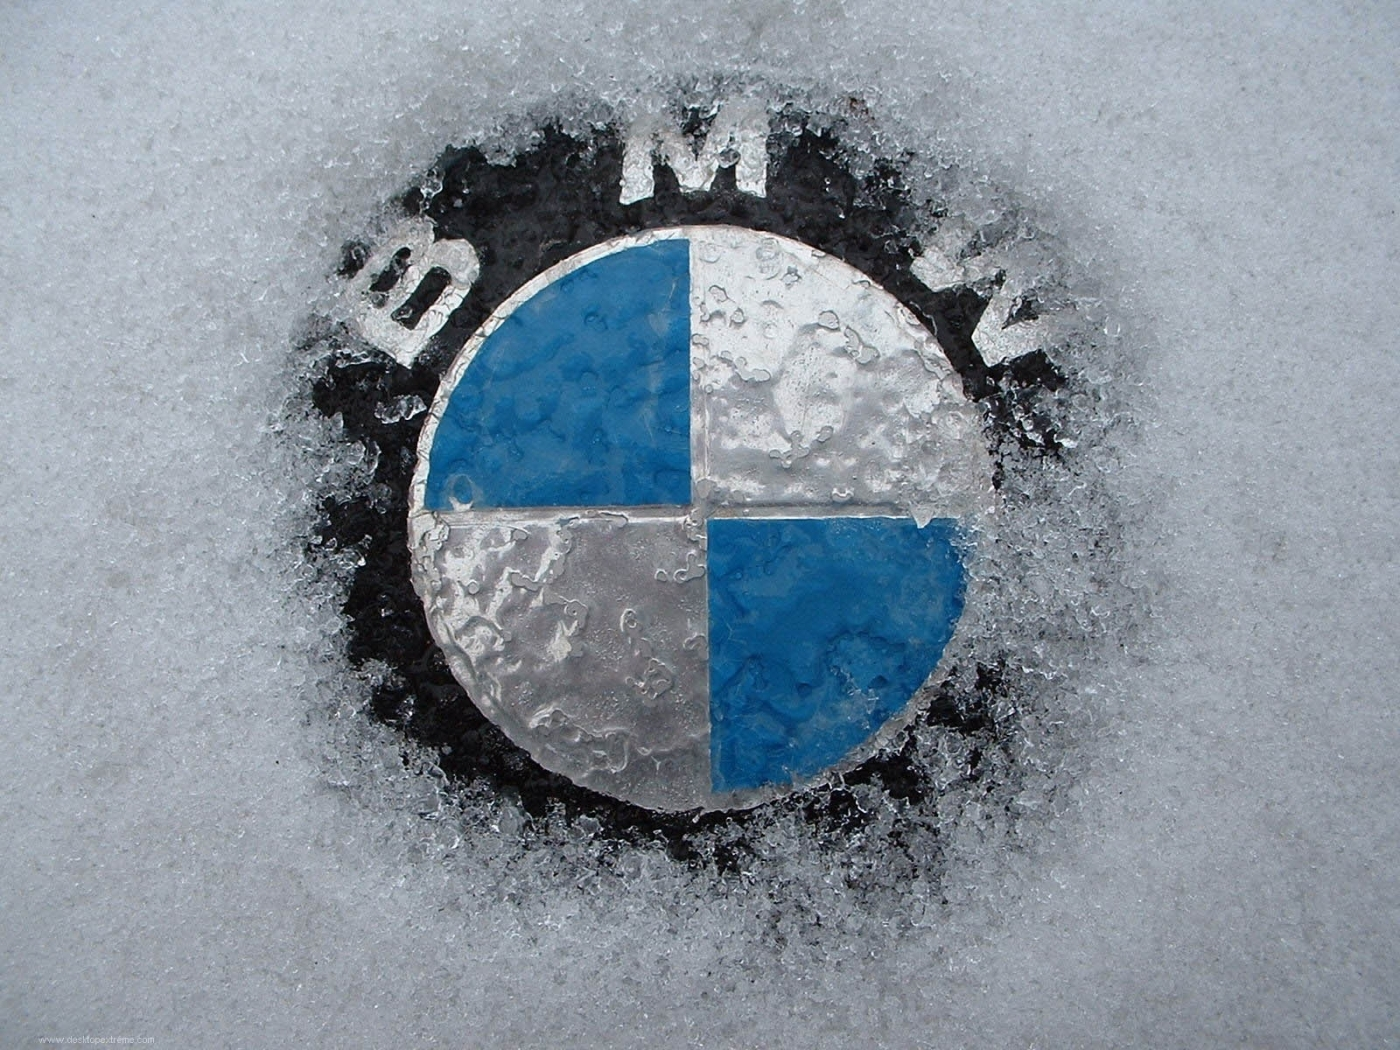 41716 descargar fondo de pantalla Bmw, Objetos, Nieve: protectores de pantalla e imágenes gratis